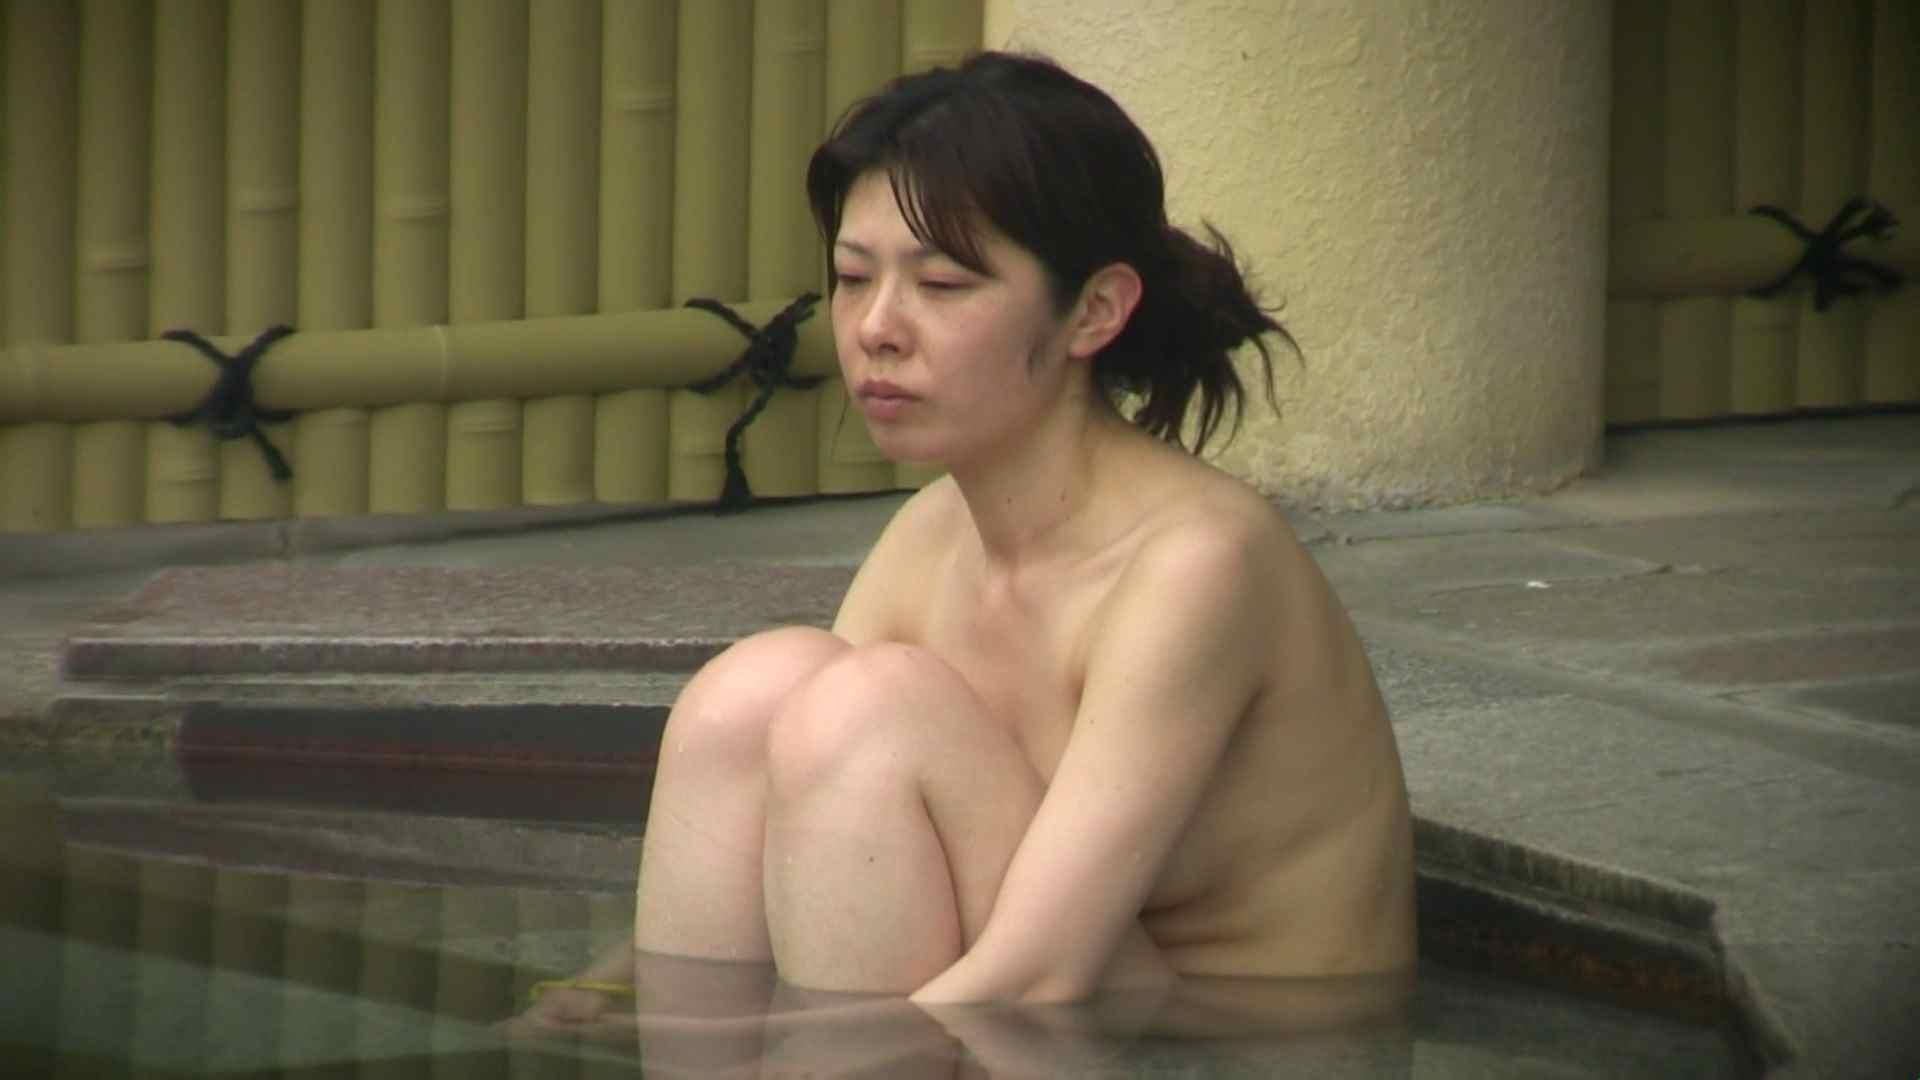 Aquaな露天風呂Vol.676 盗撮シリーズ | 露天風呂編  83PIX 65